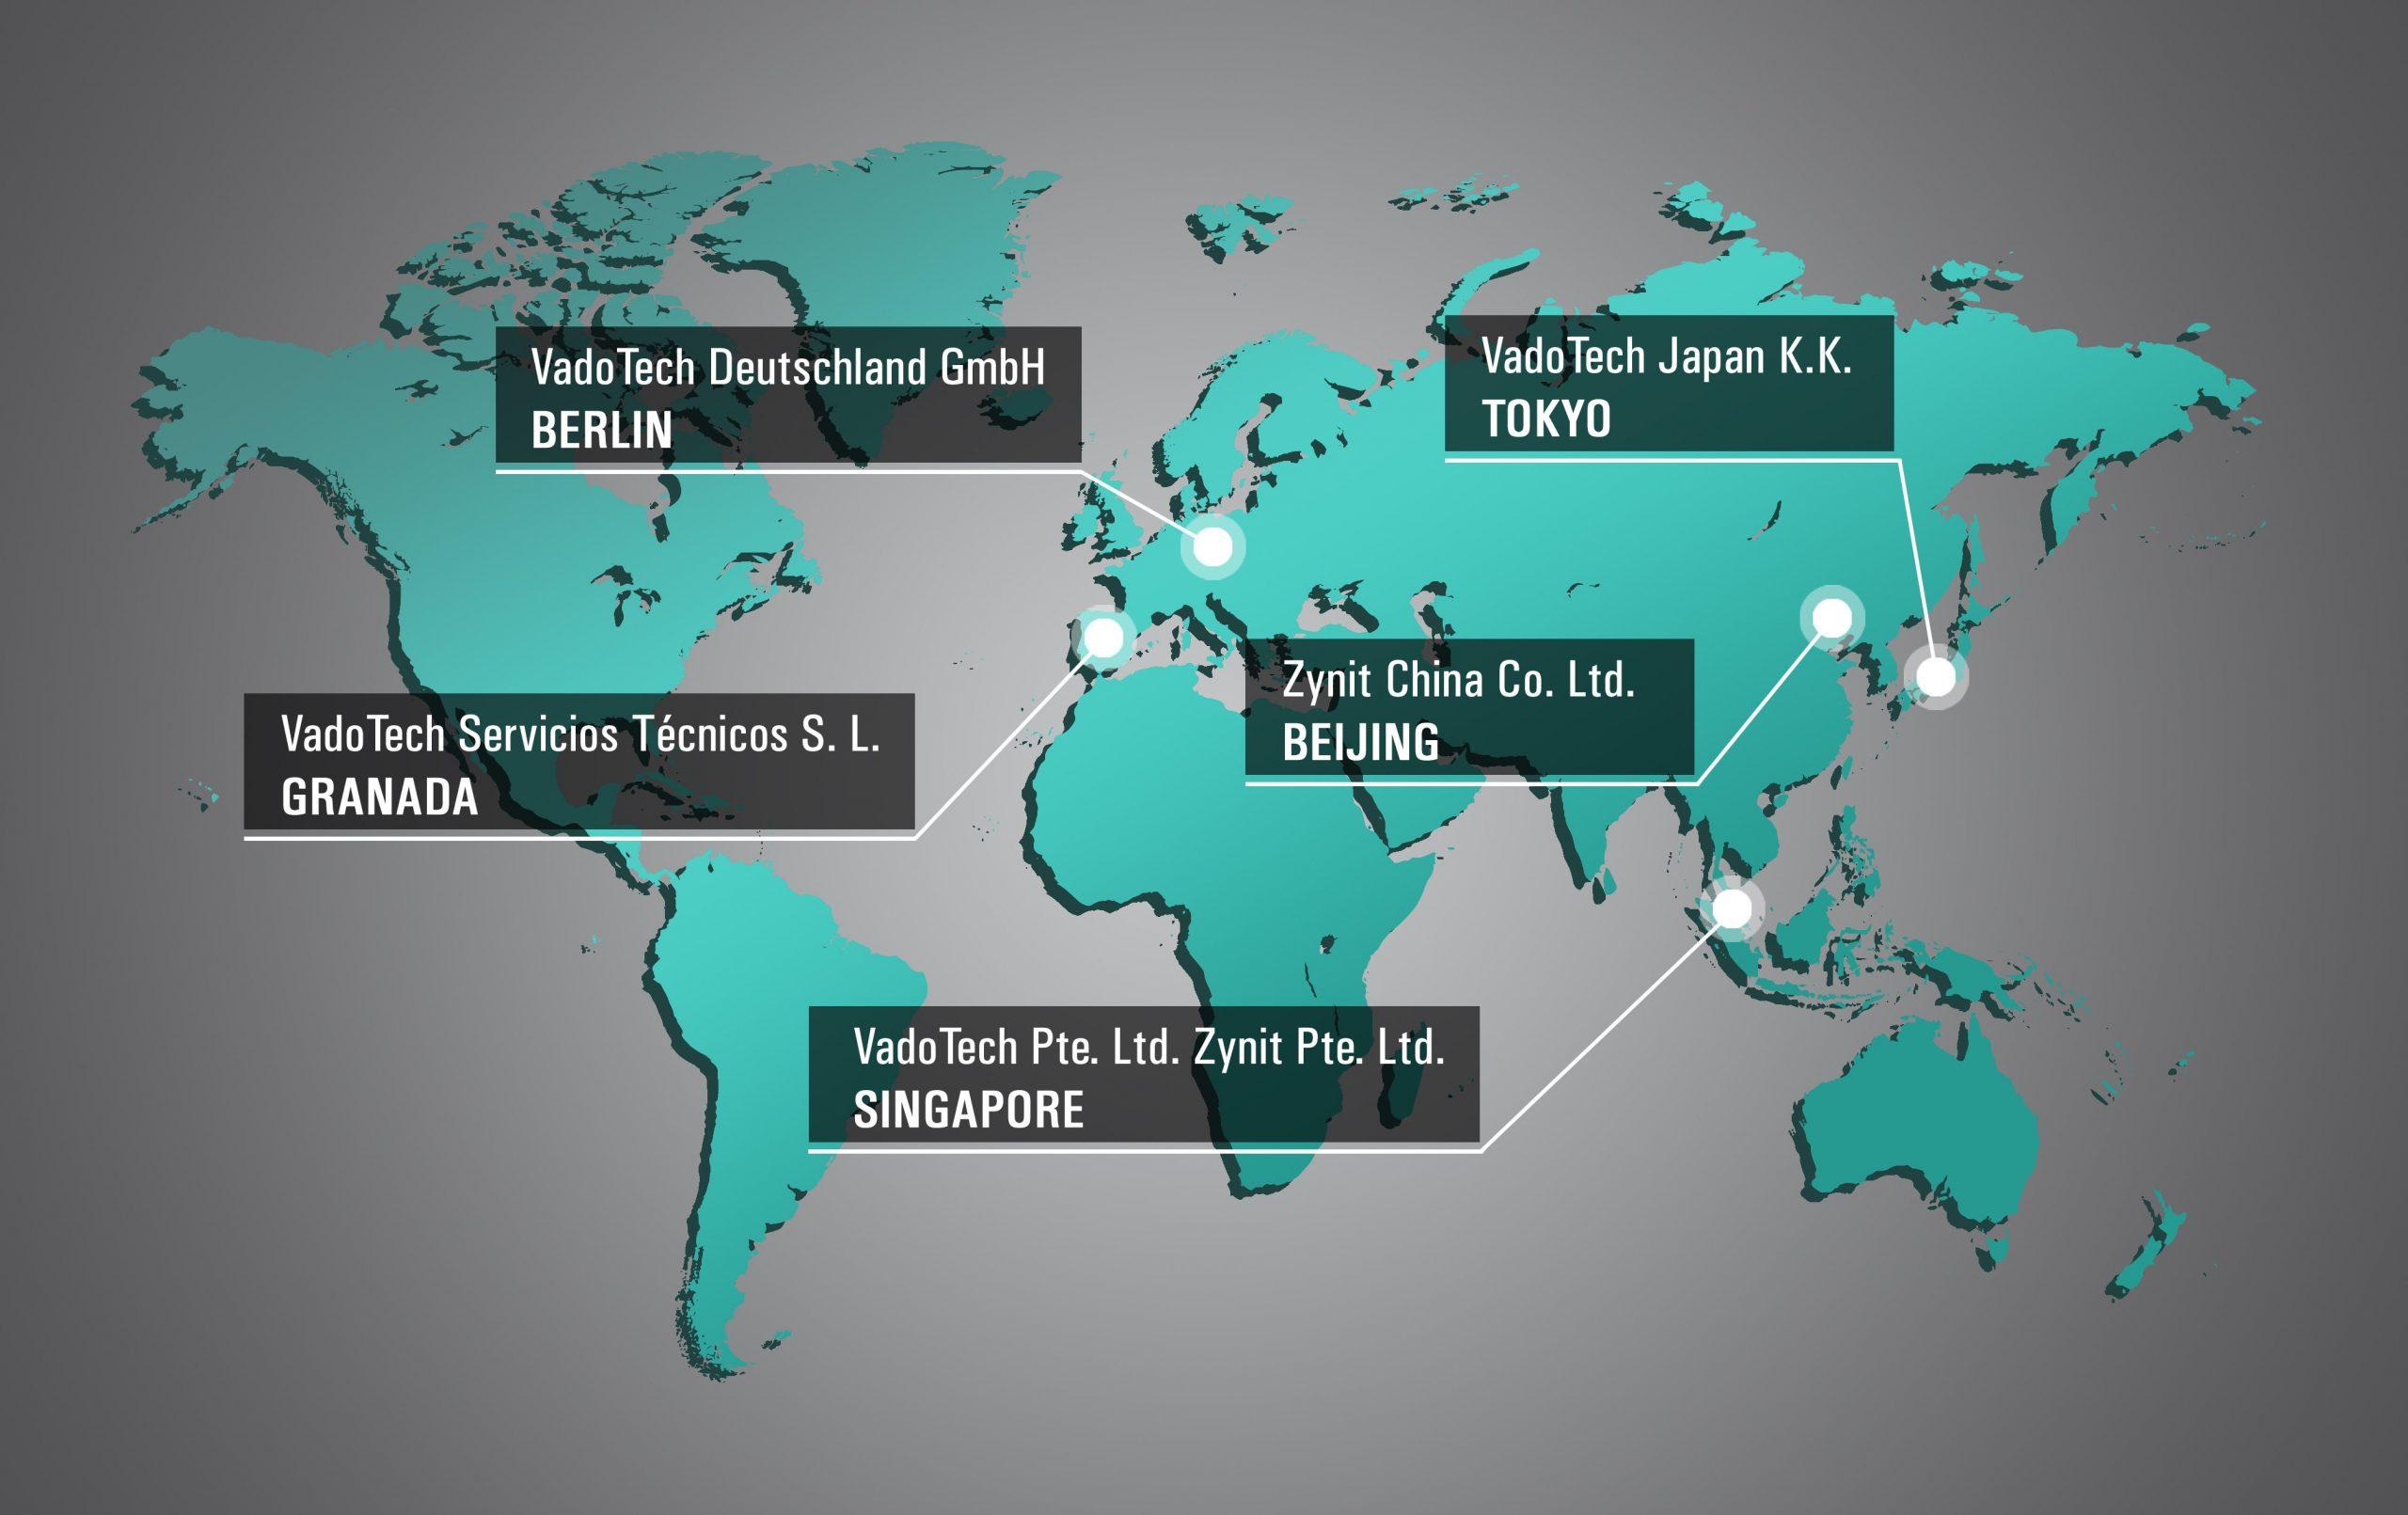 VadoTech和Zynit的全國性公司所在地。柏林的VadoTech Germany GmbH。 VadoTech ServiciosTécnicosS.L.在格拉納達。 VadoTech Japan K.K.在東京。賽尼特中國有限公司在北京。 VadoTech Pte。有限公司在新加坡。